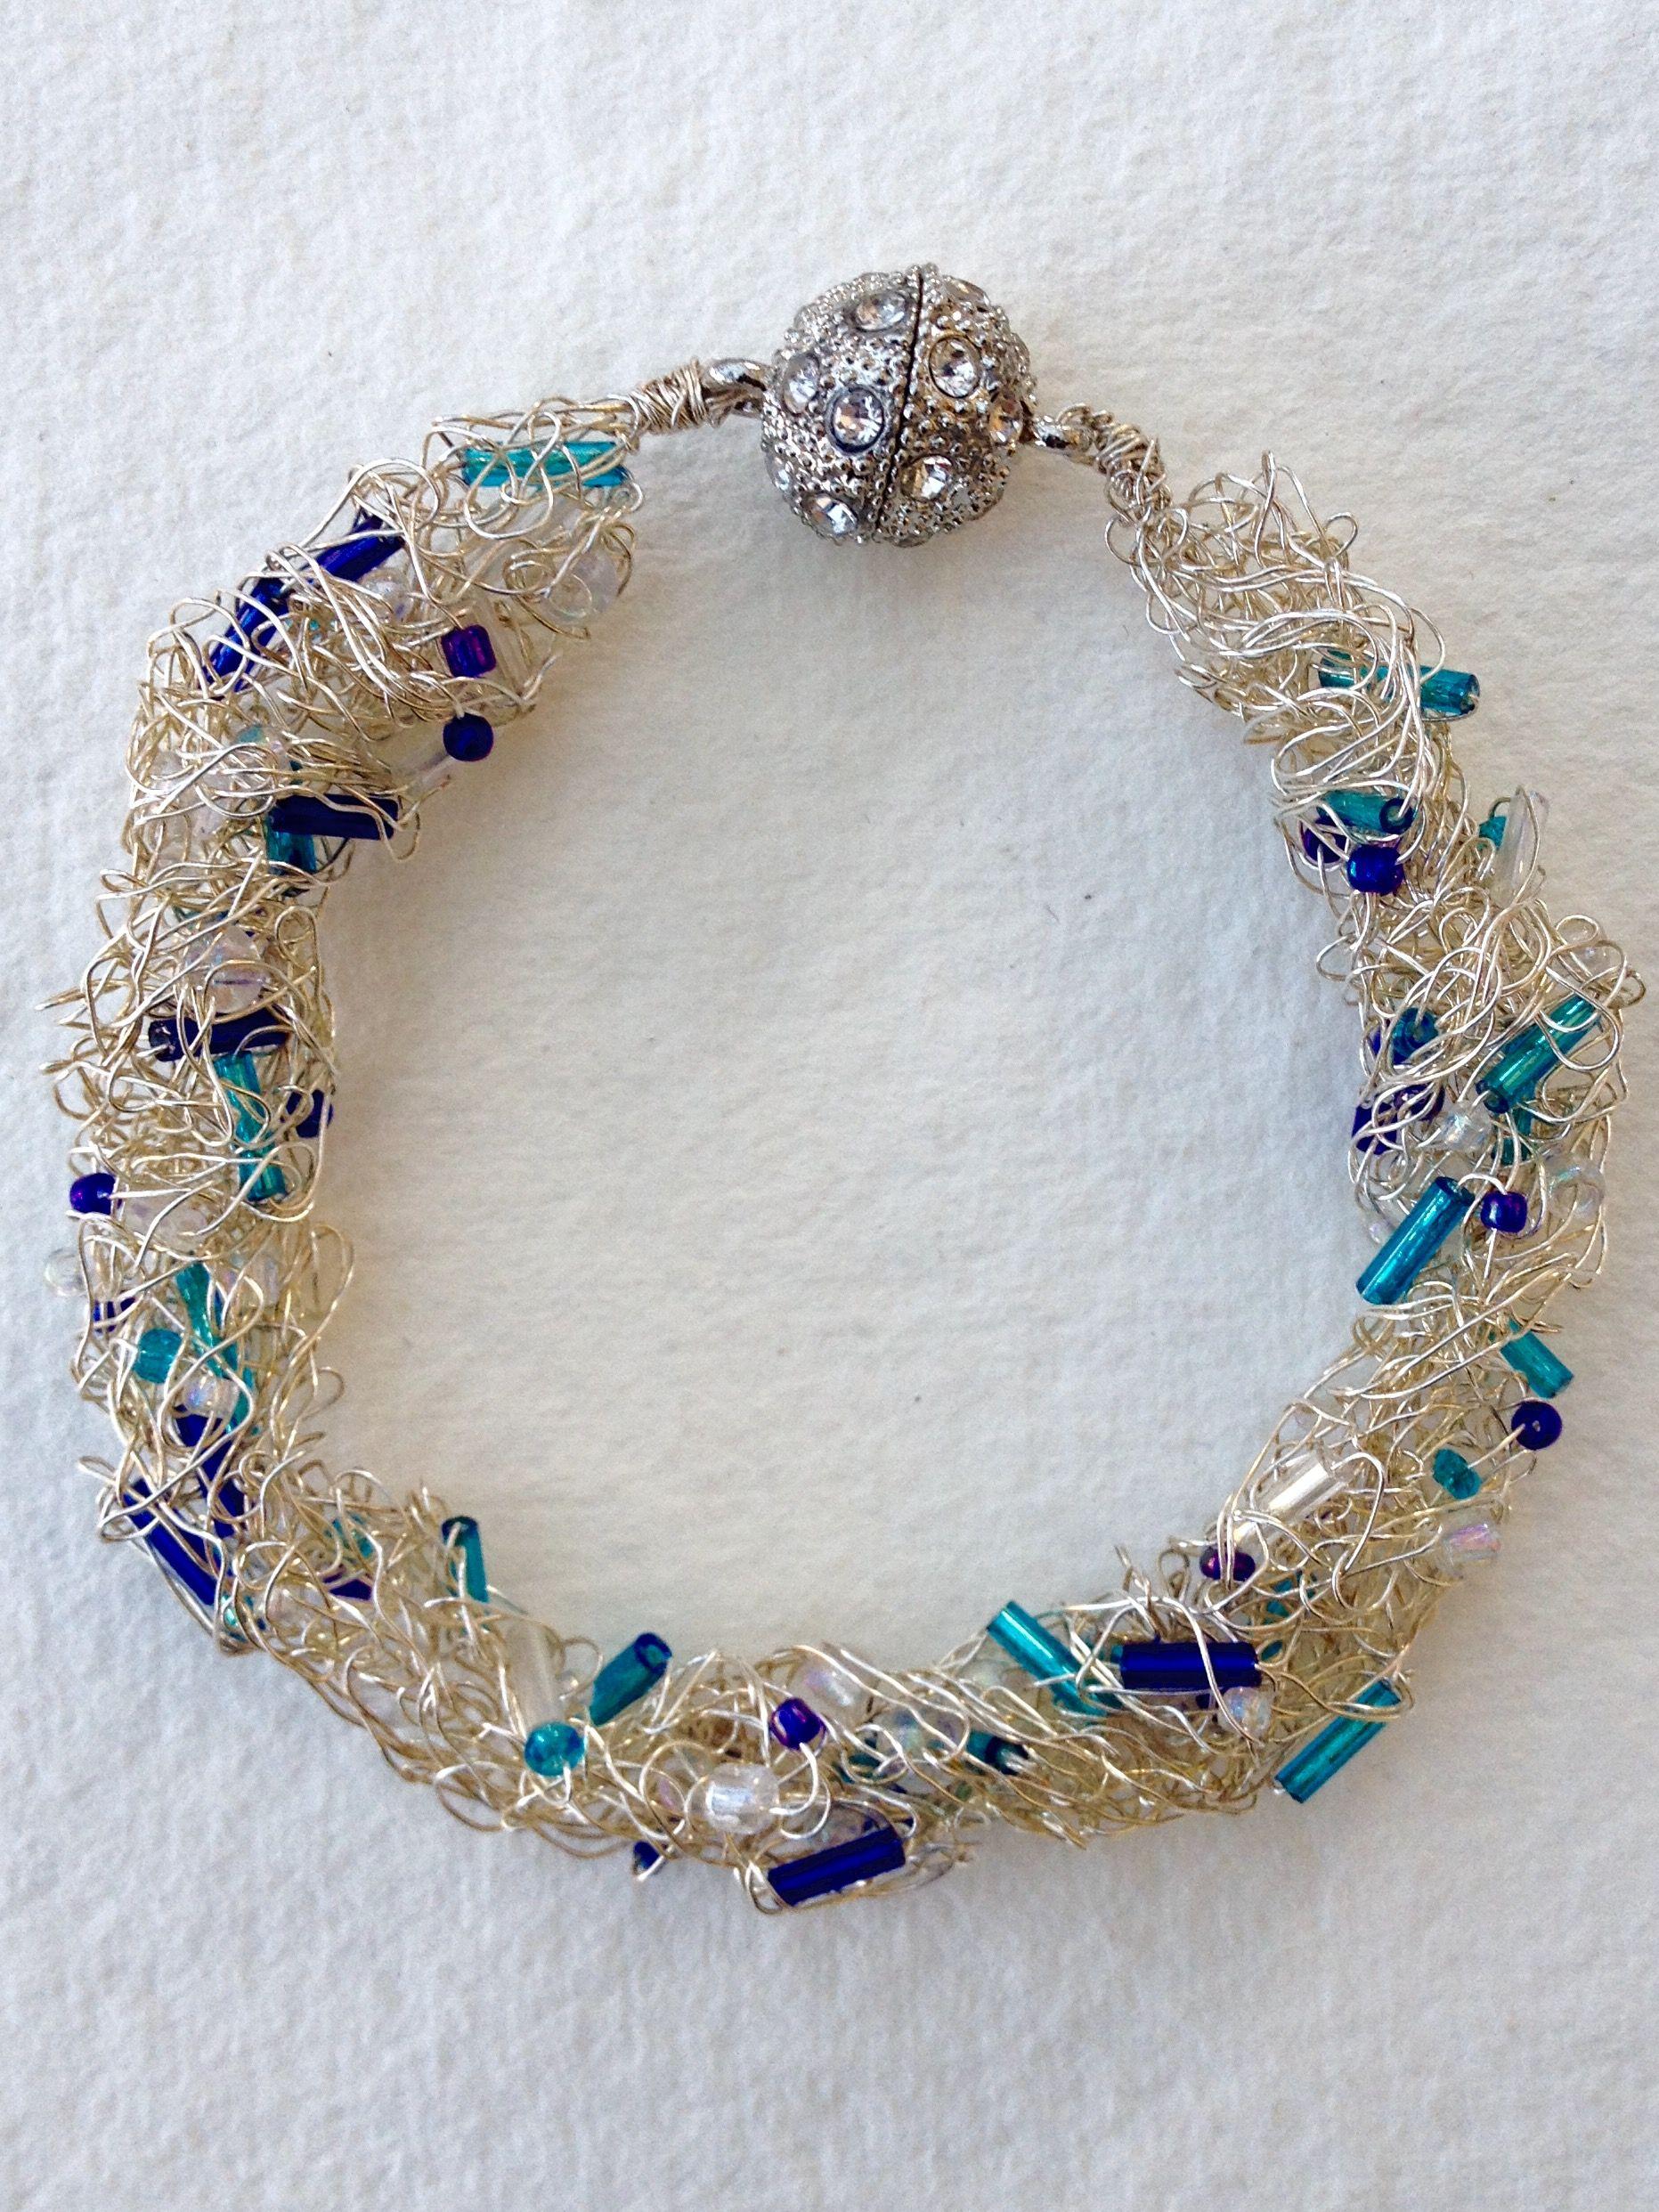 Silver wire crochet bracelet: made by M(e) | κοσμηματα | Pinterest ...